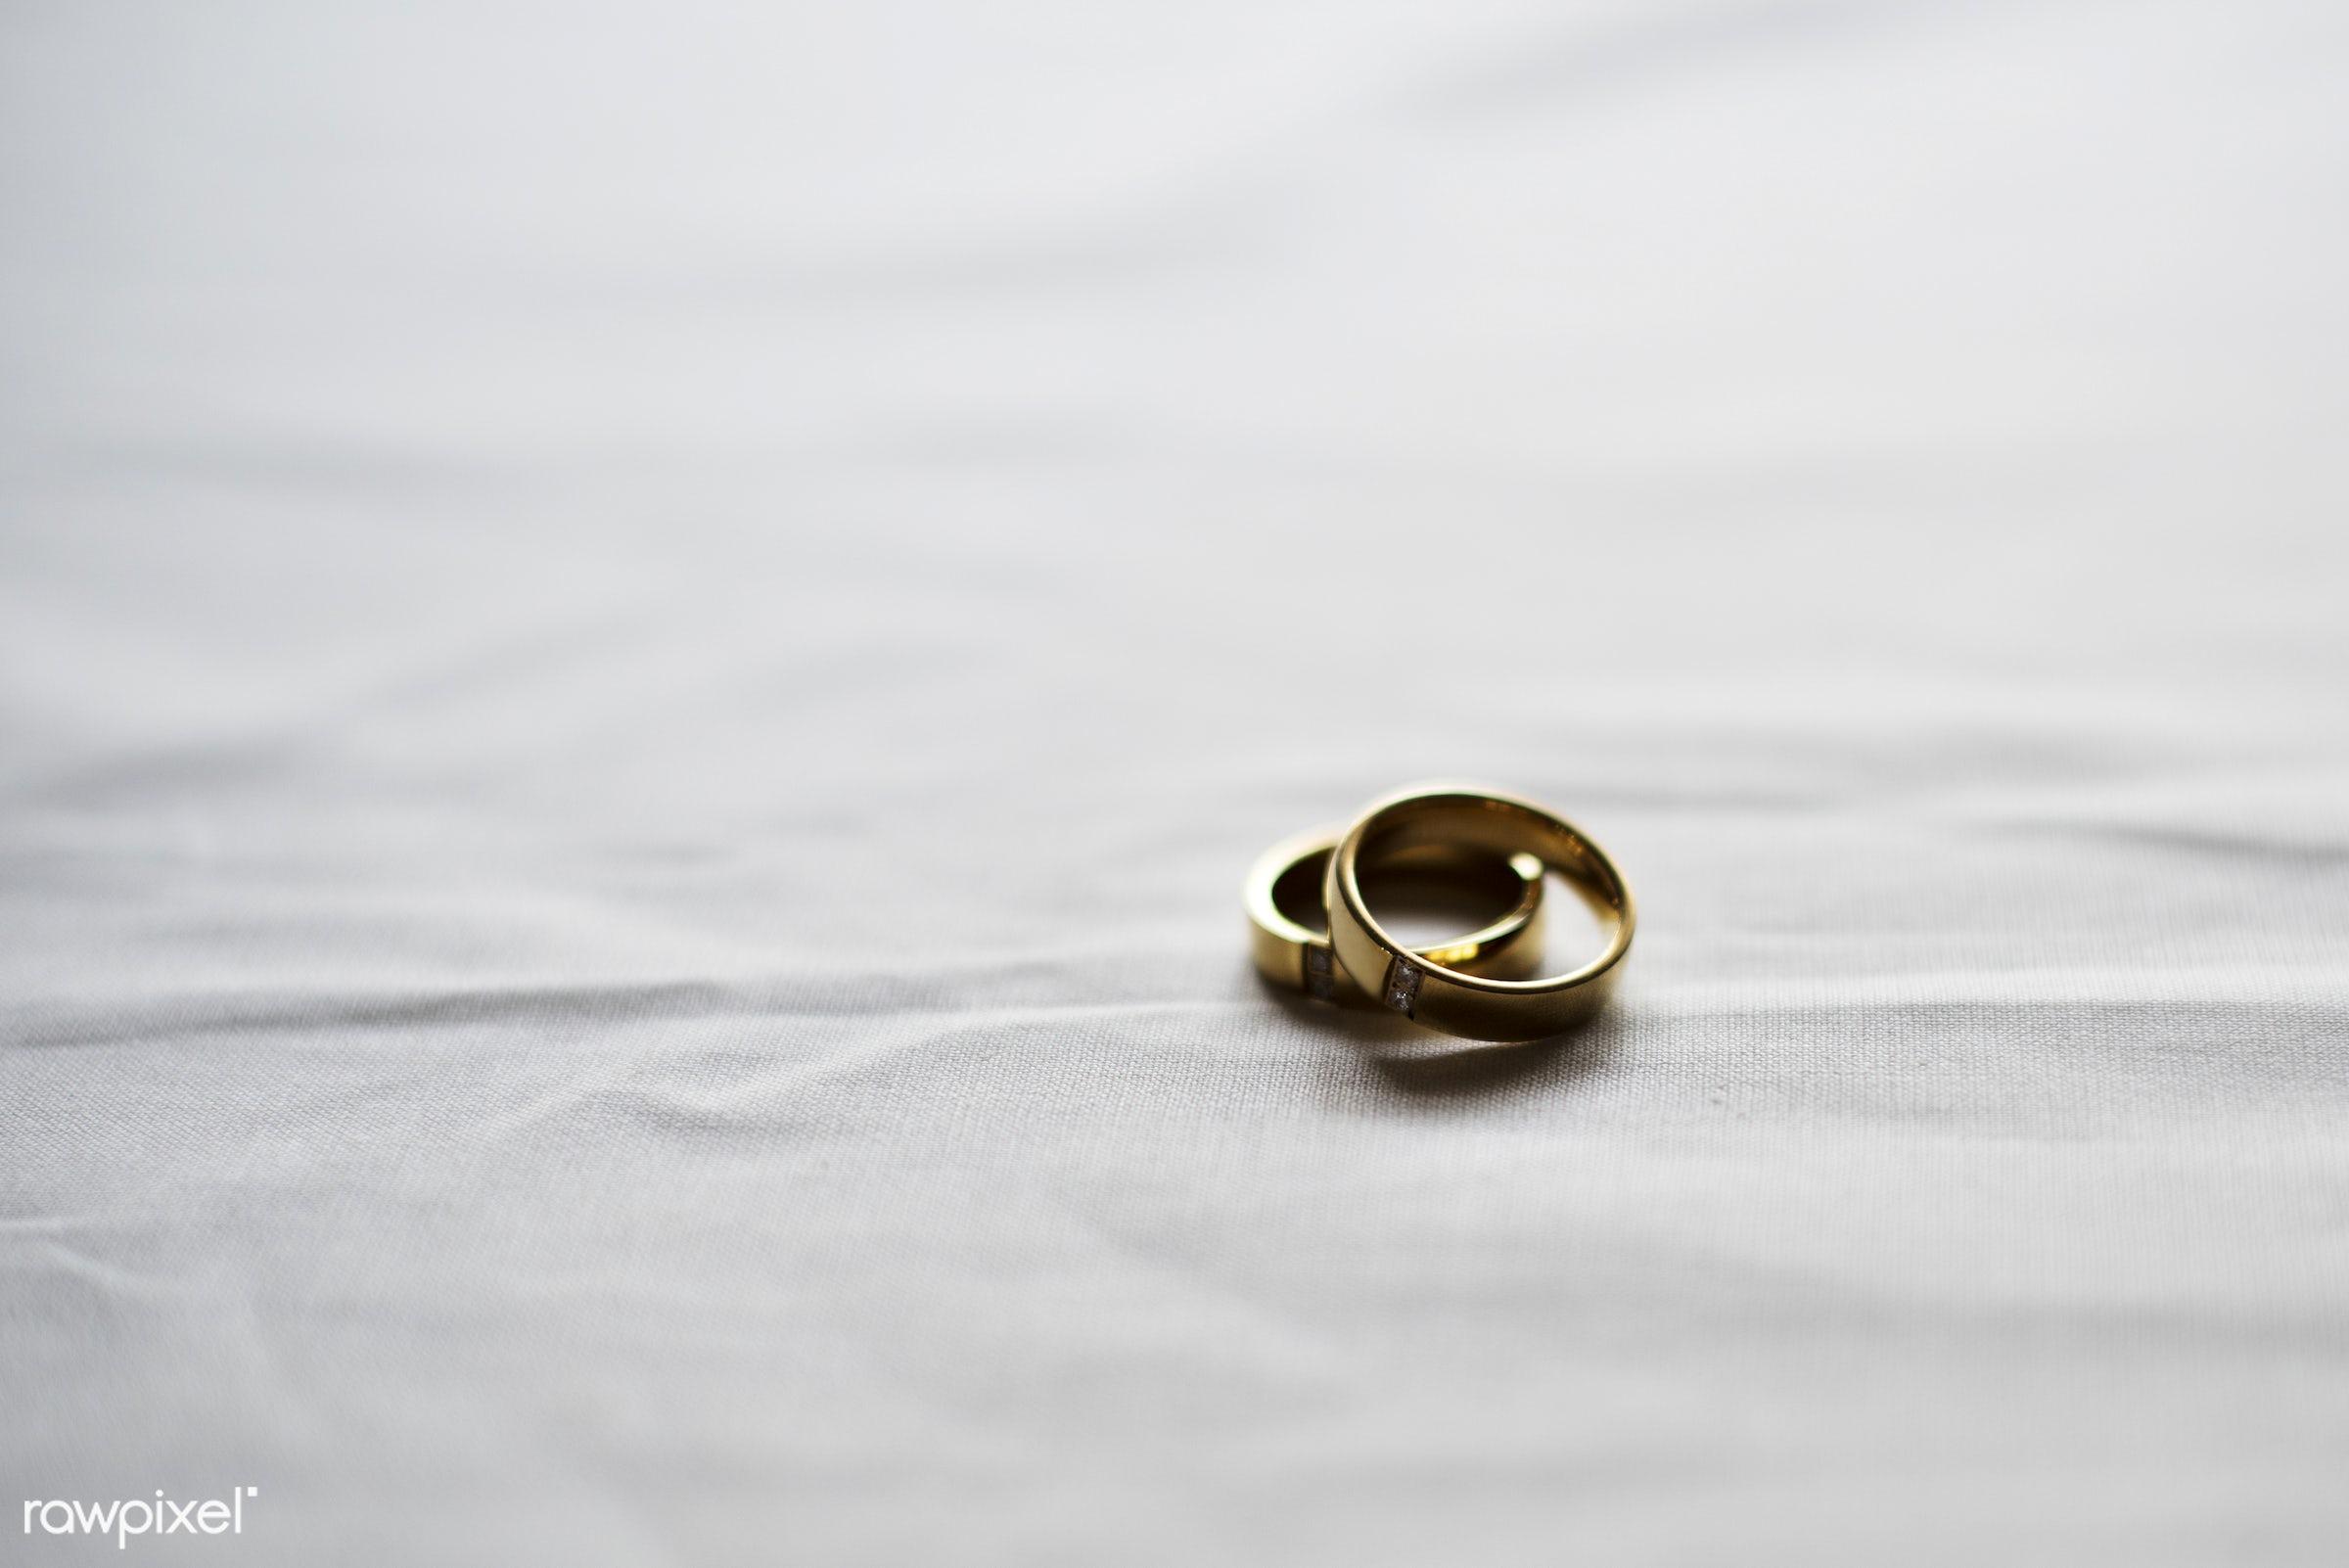 arrangement, ceremony, closeup, engagement, fiance, gold, jewel, marriage, nobody, pair, prepare, proposal, rings, surprise...